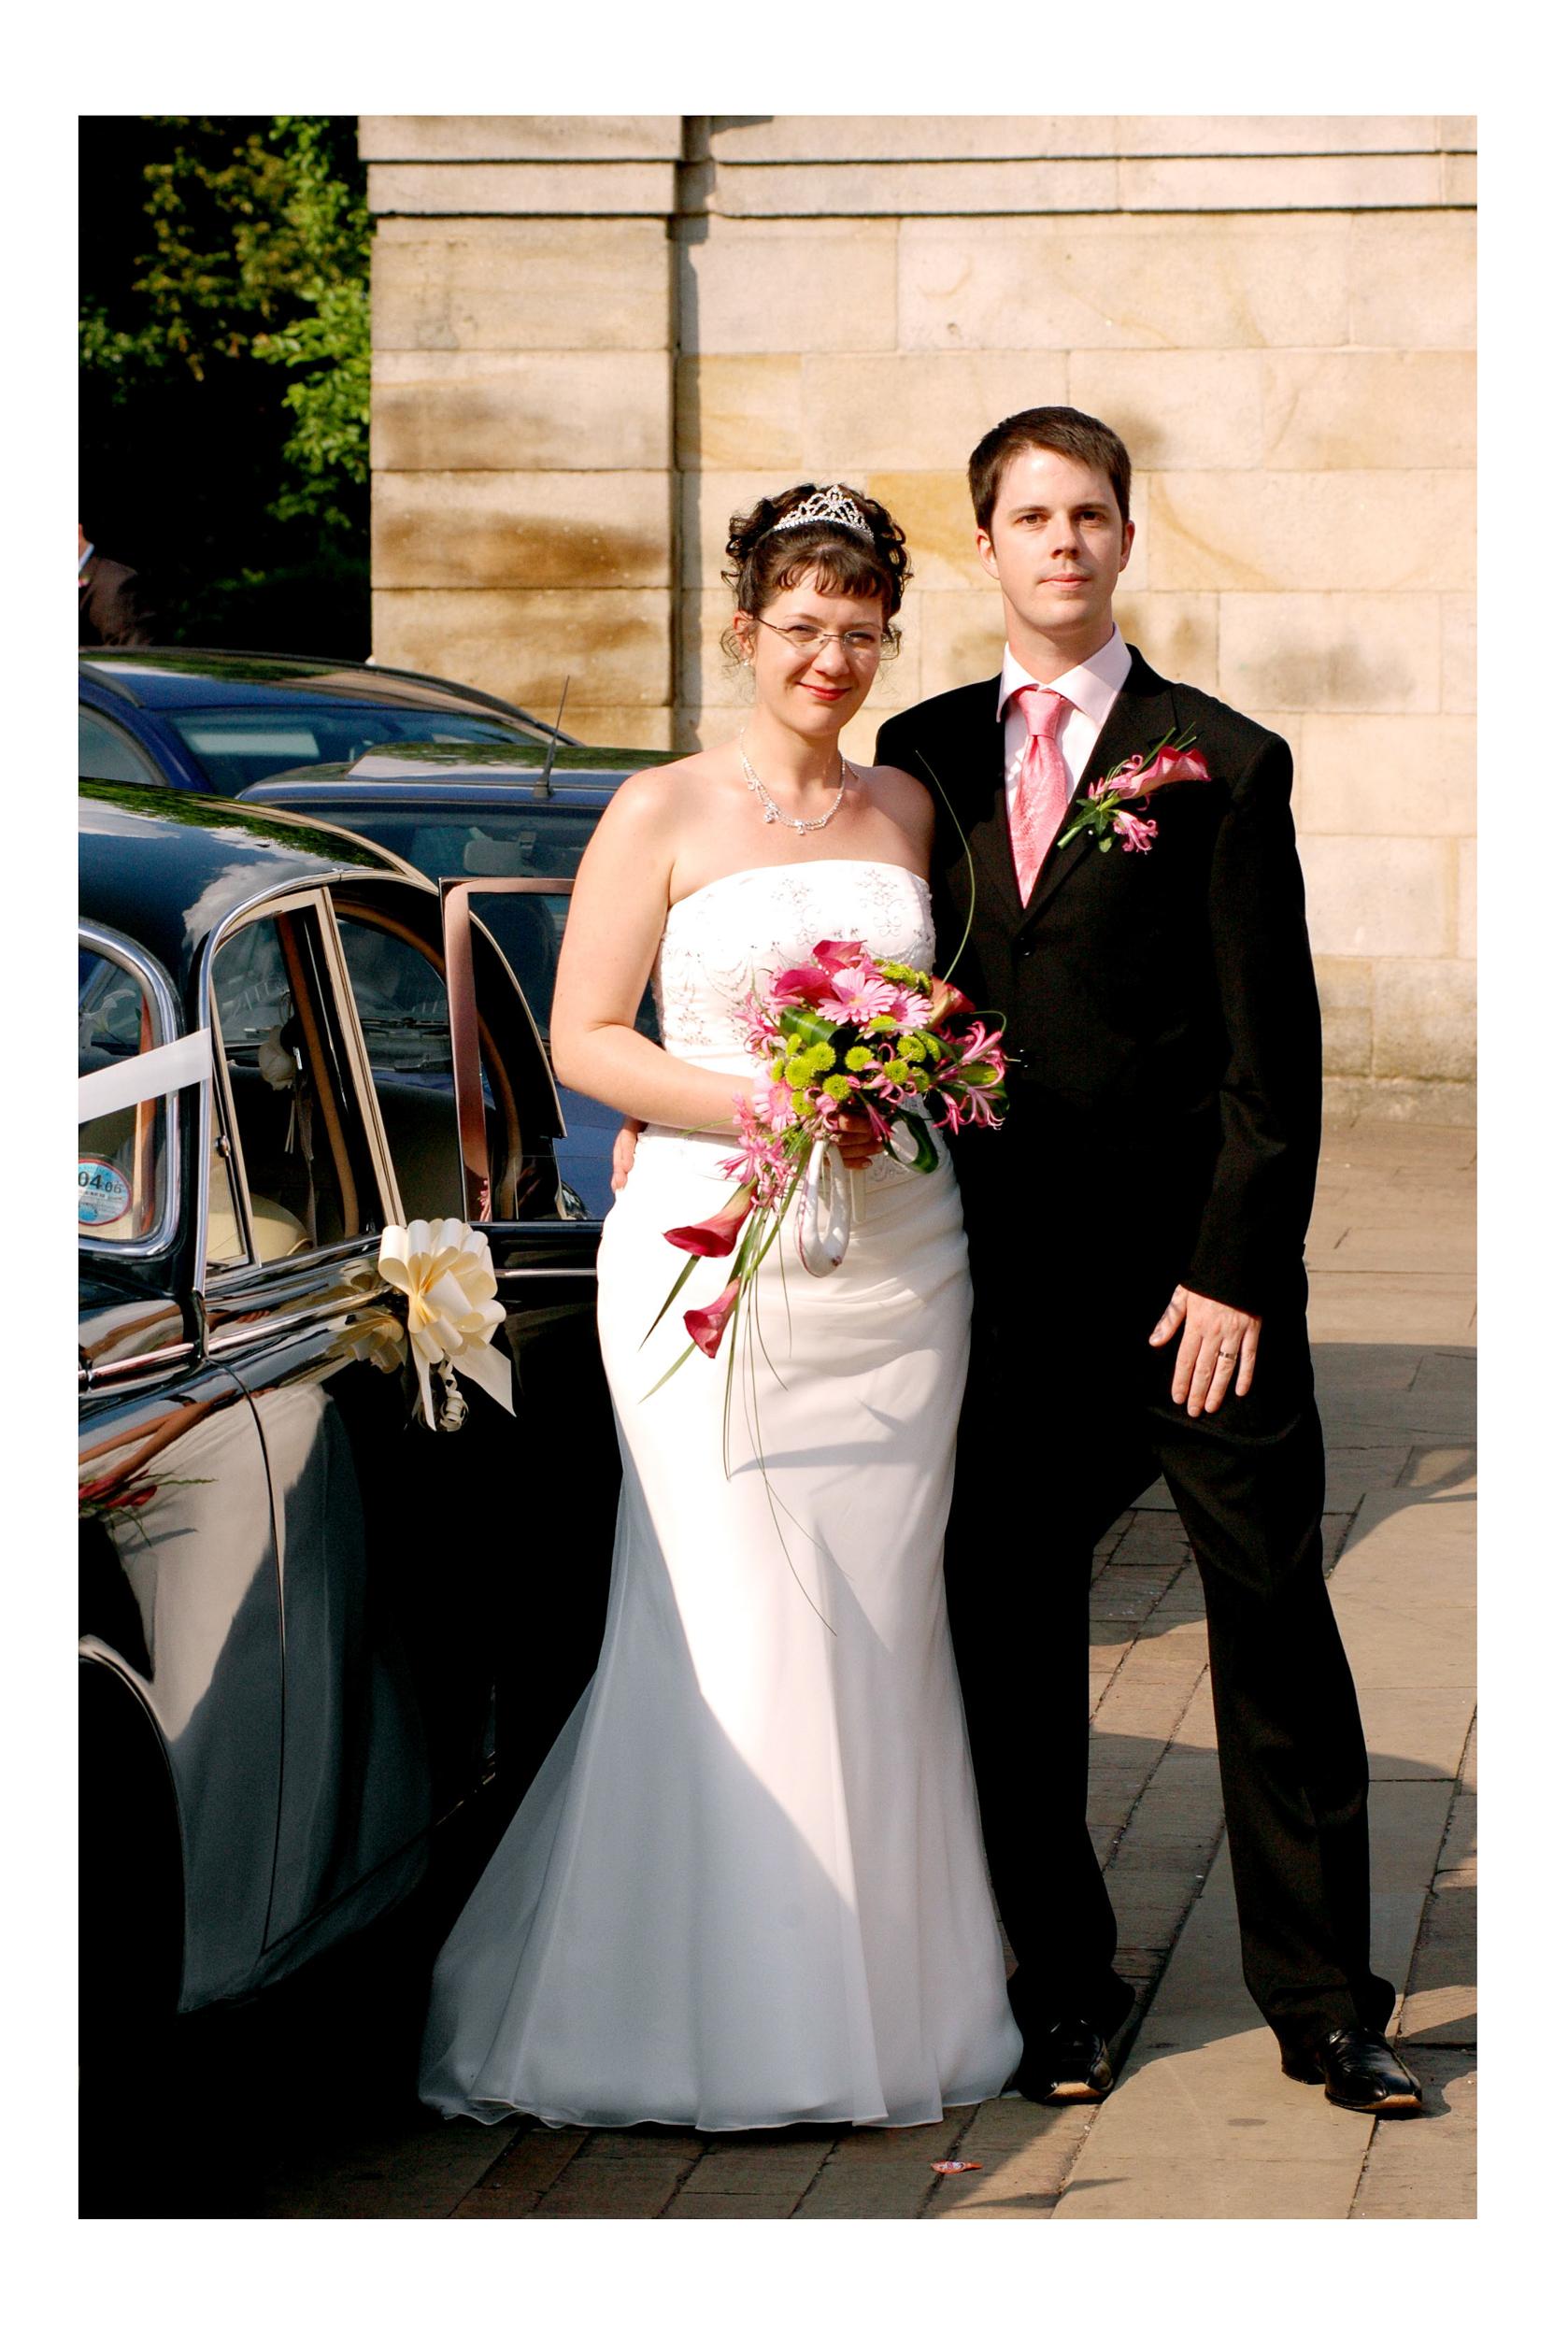 REPORTAGE-WEDDING-PHOTOGRAPHY-SET-UK-32.jpg